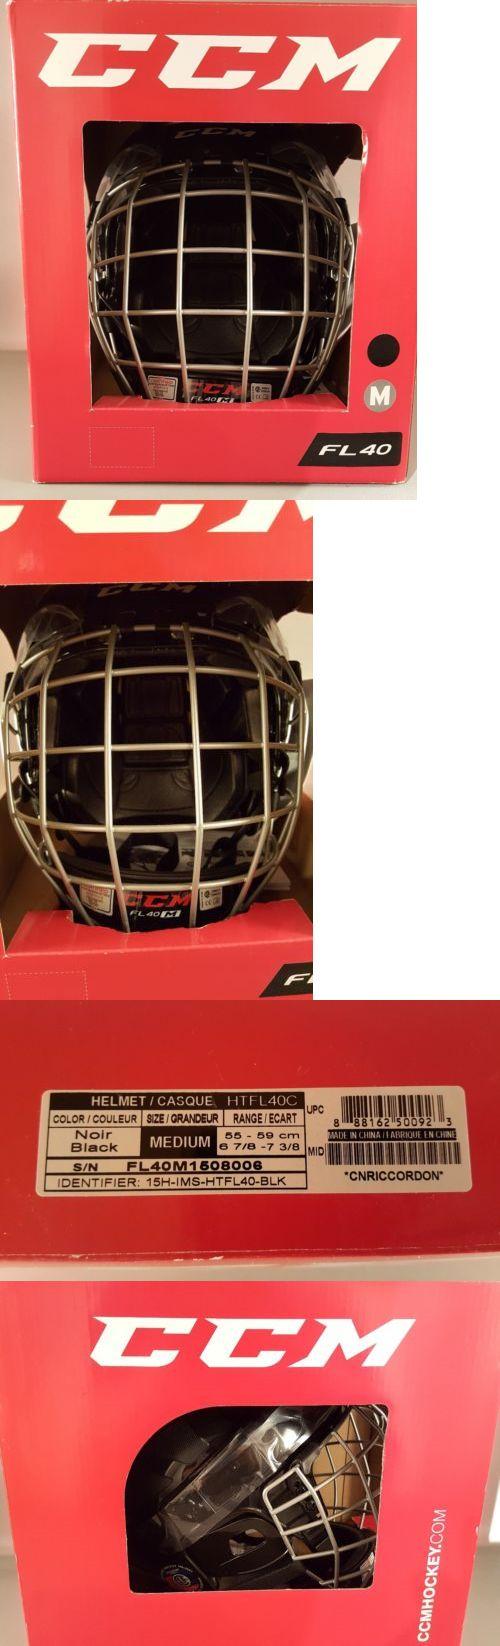 Helmets 20854: Ccm Fitlite Fl40 Adjustable Ice Hockey Helmet And Mask Combo M Medium -> BUY IT NOW ONLY: $34.99 on eBay!